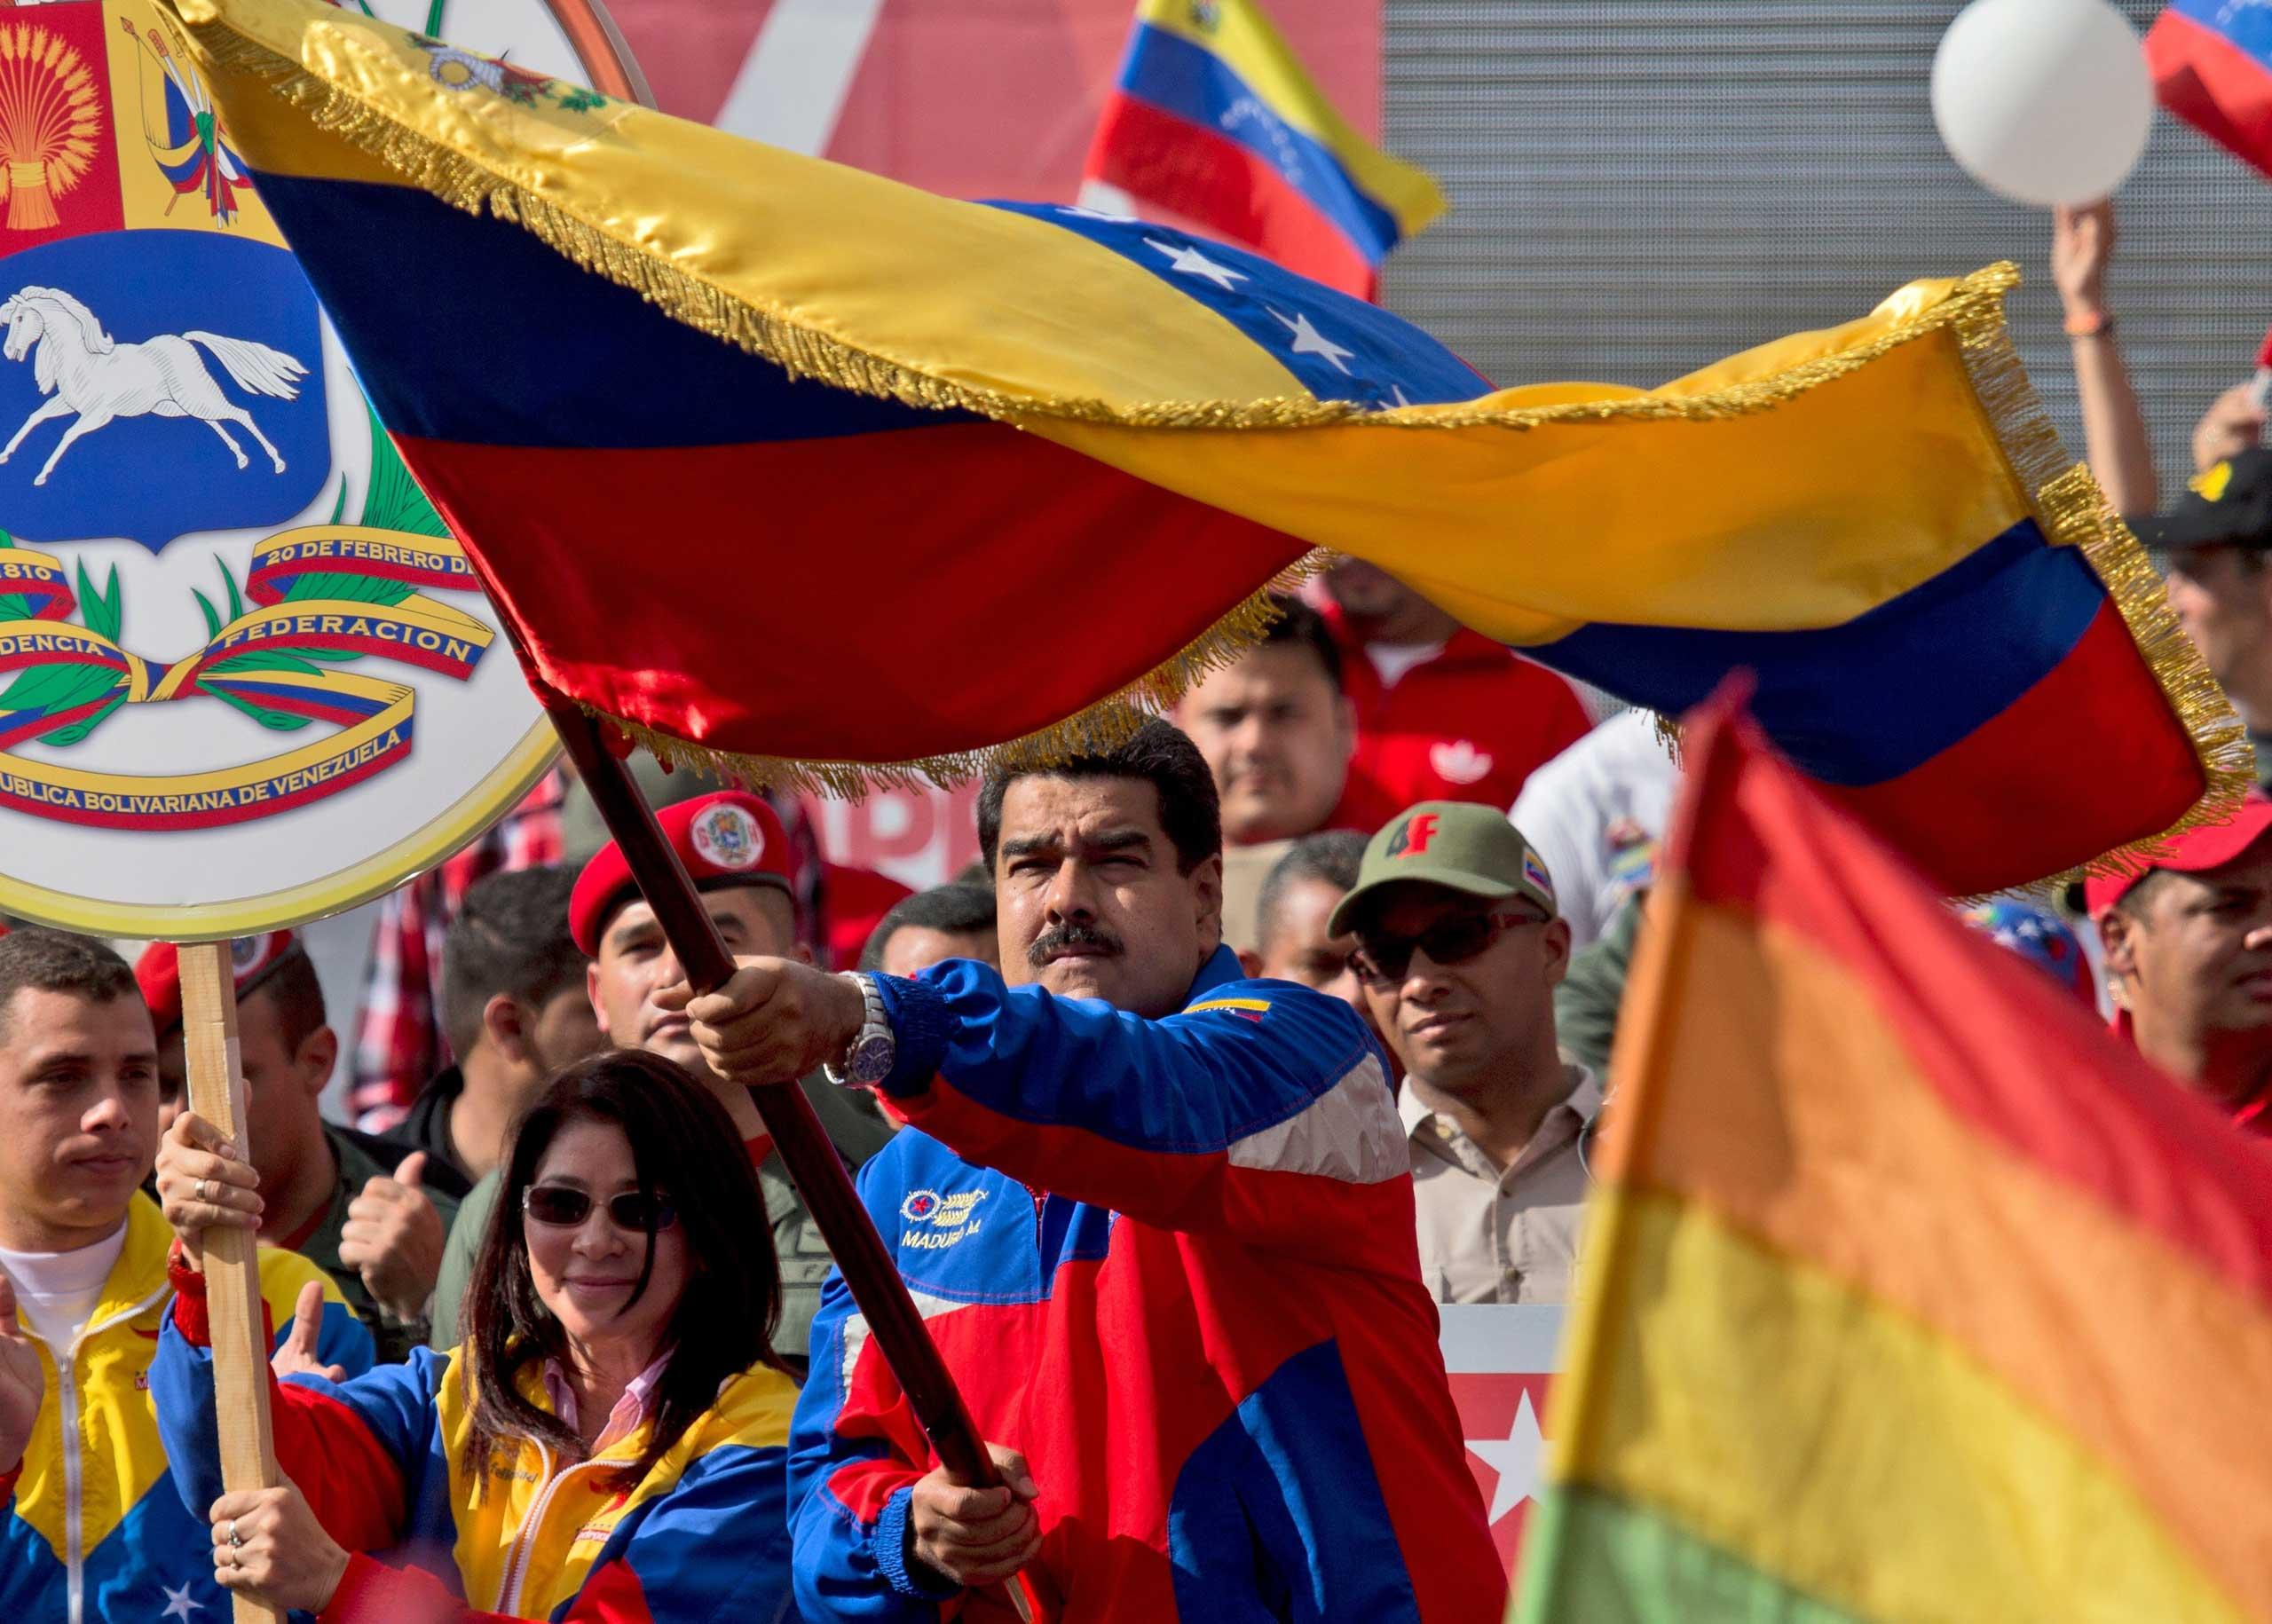 Venezuela's President Nicolas Maduro, center, in Caracas, Venezuela, on Feb. 28, 2015.